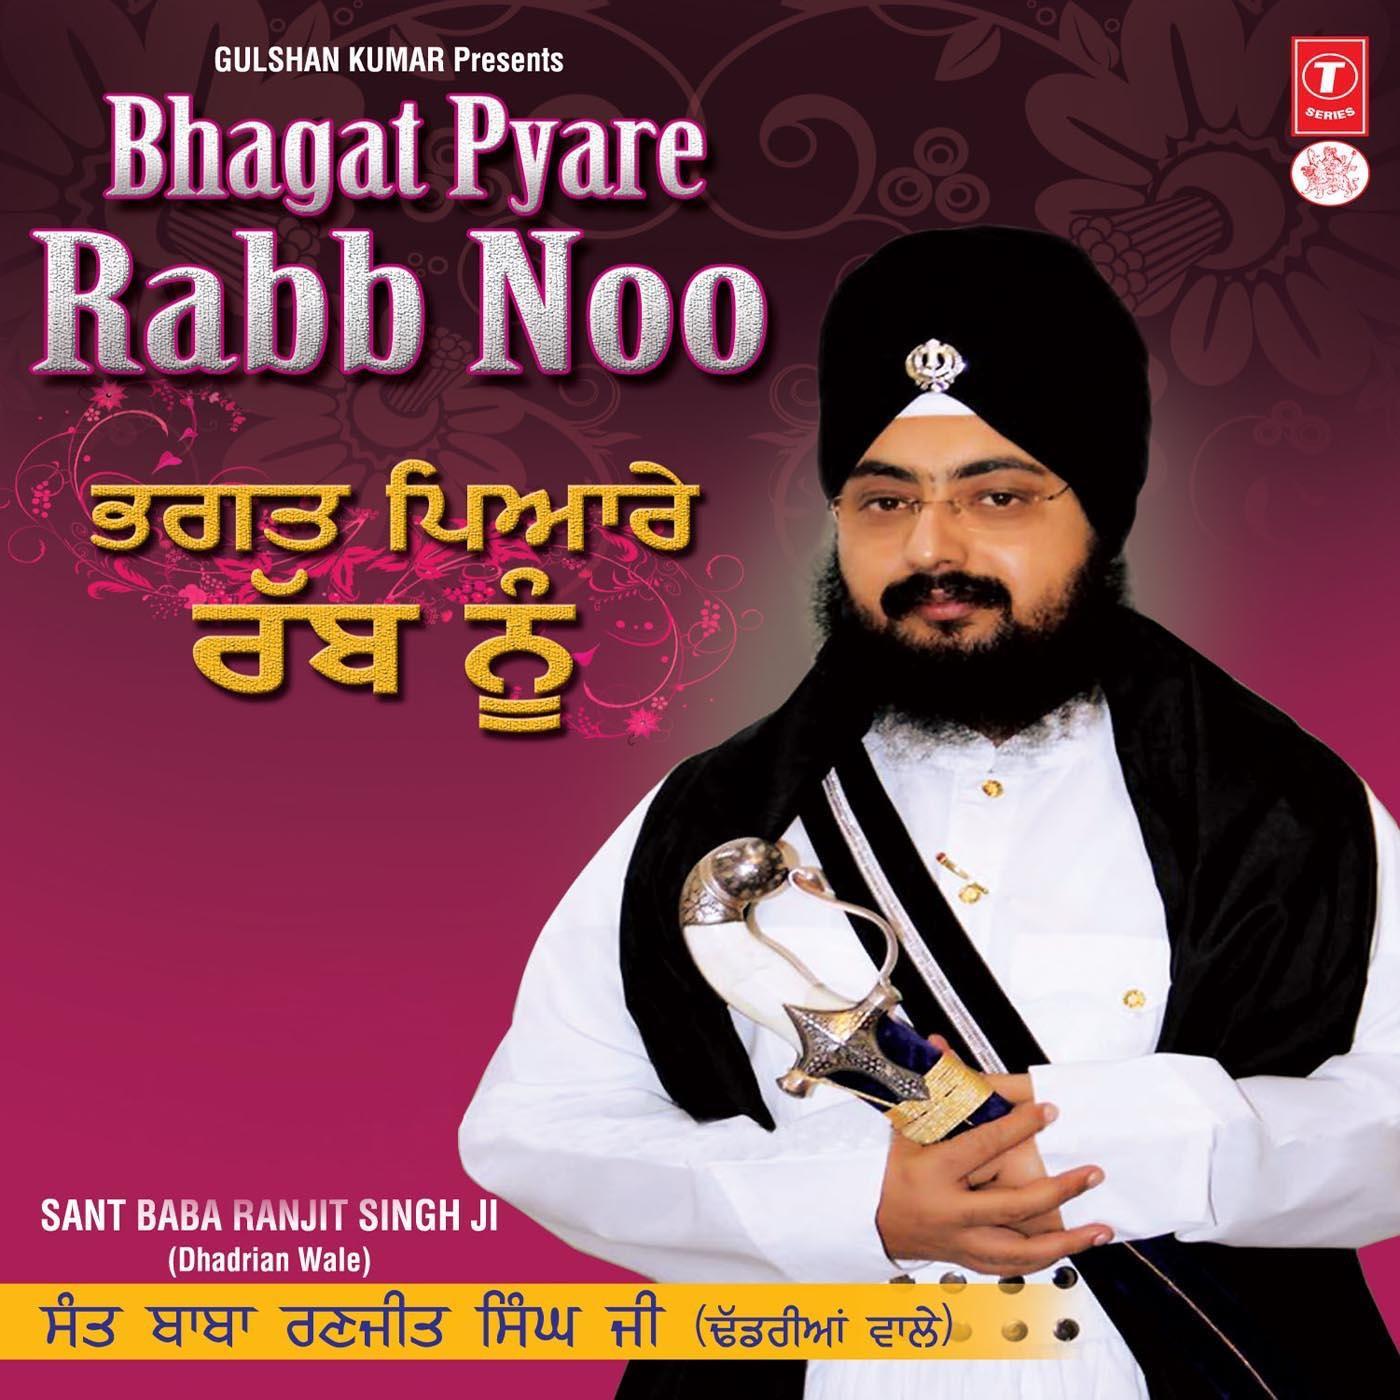 Bhagat Pyare Rabb Noo